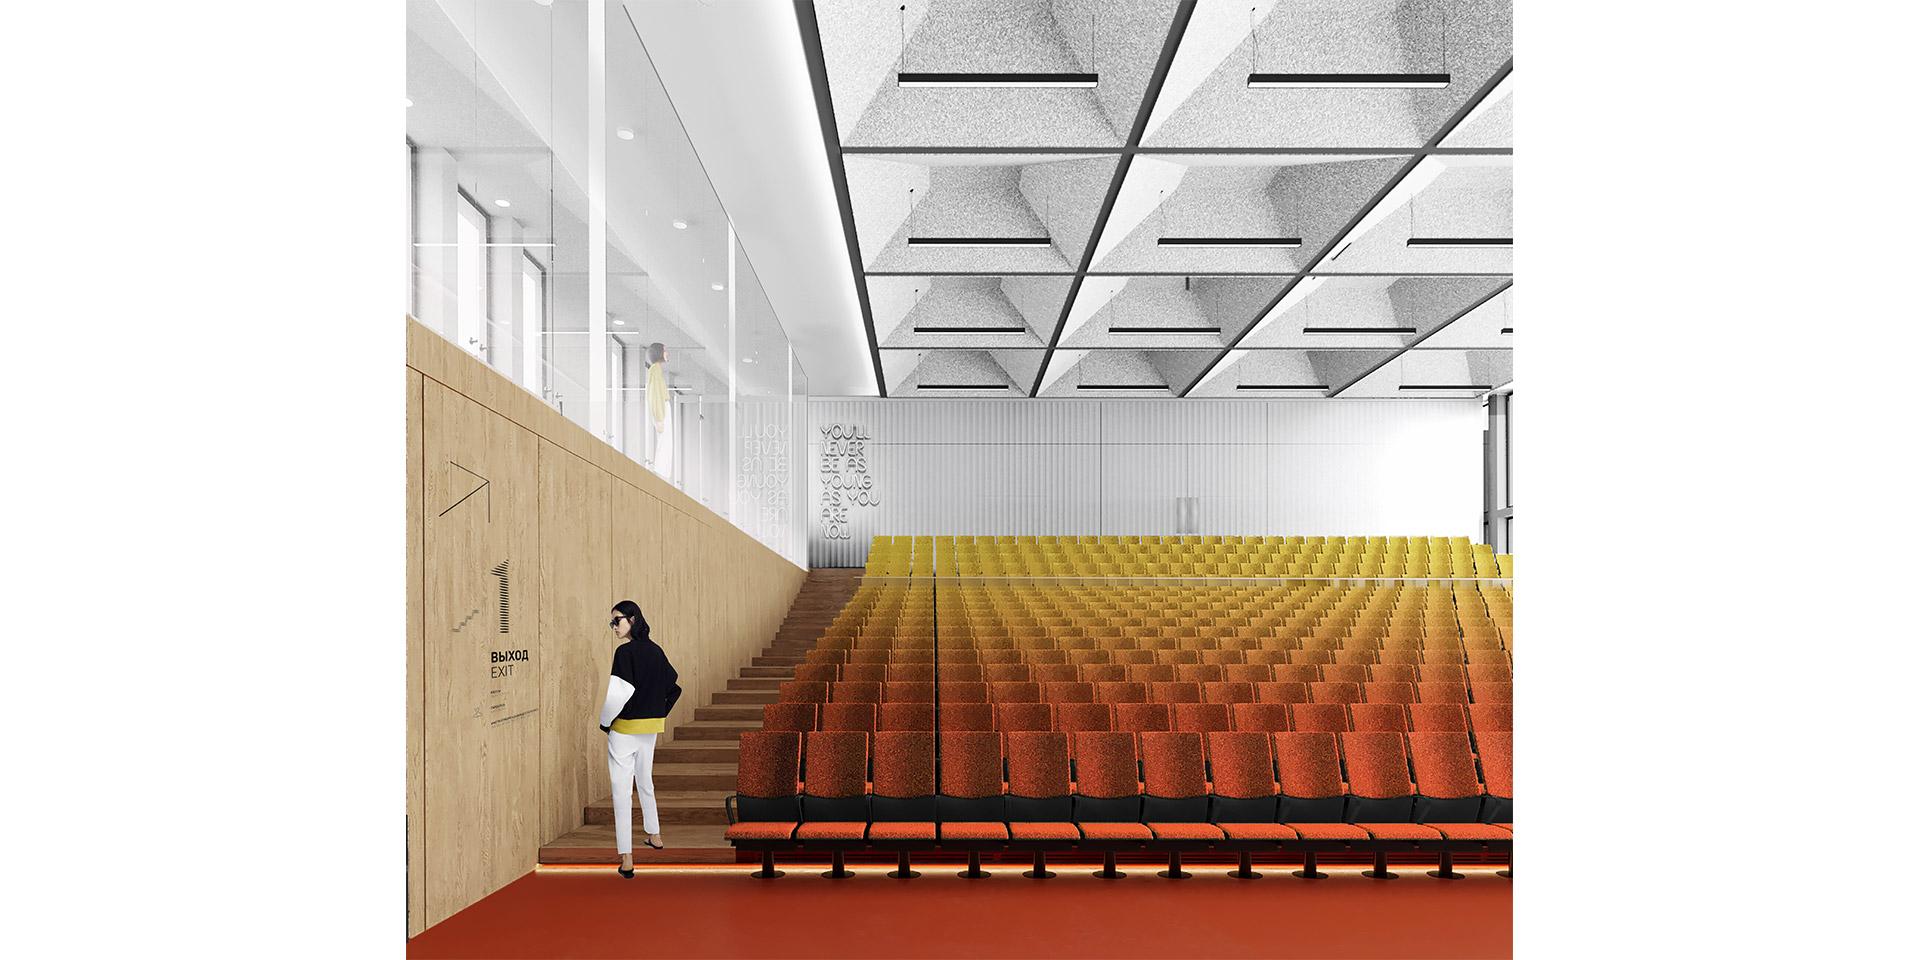 University Conference Center Architectural Concept